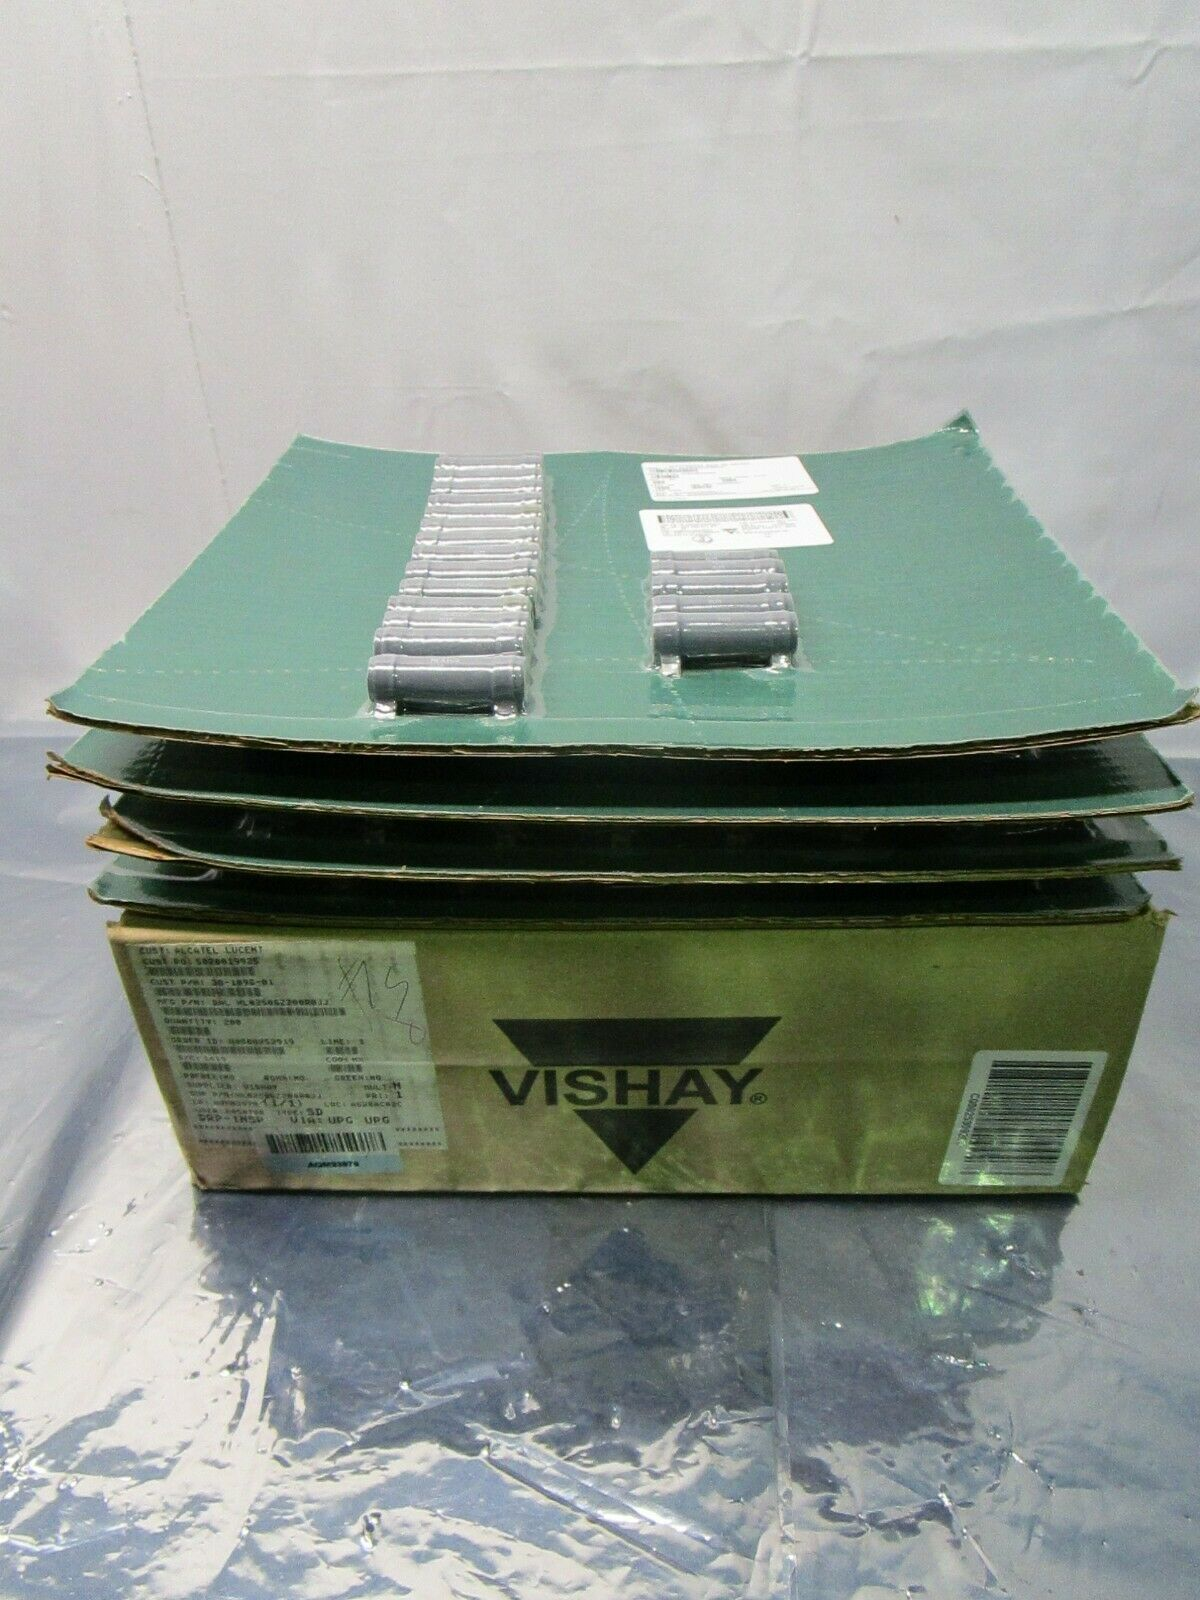 1 Lot of 200 Vishay HL02506Z200R0JJ Wirewound Resistors - Chassis Mount, 102581